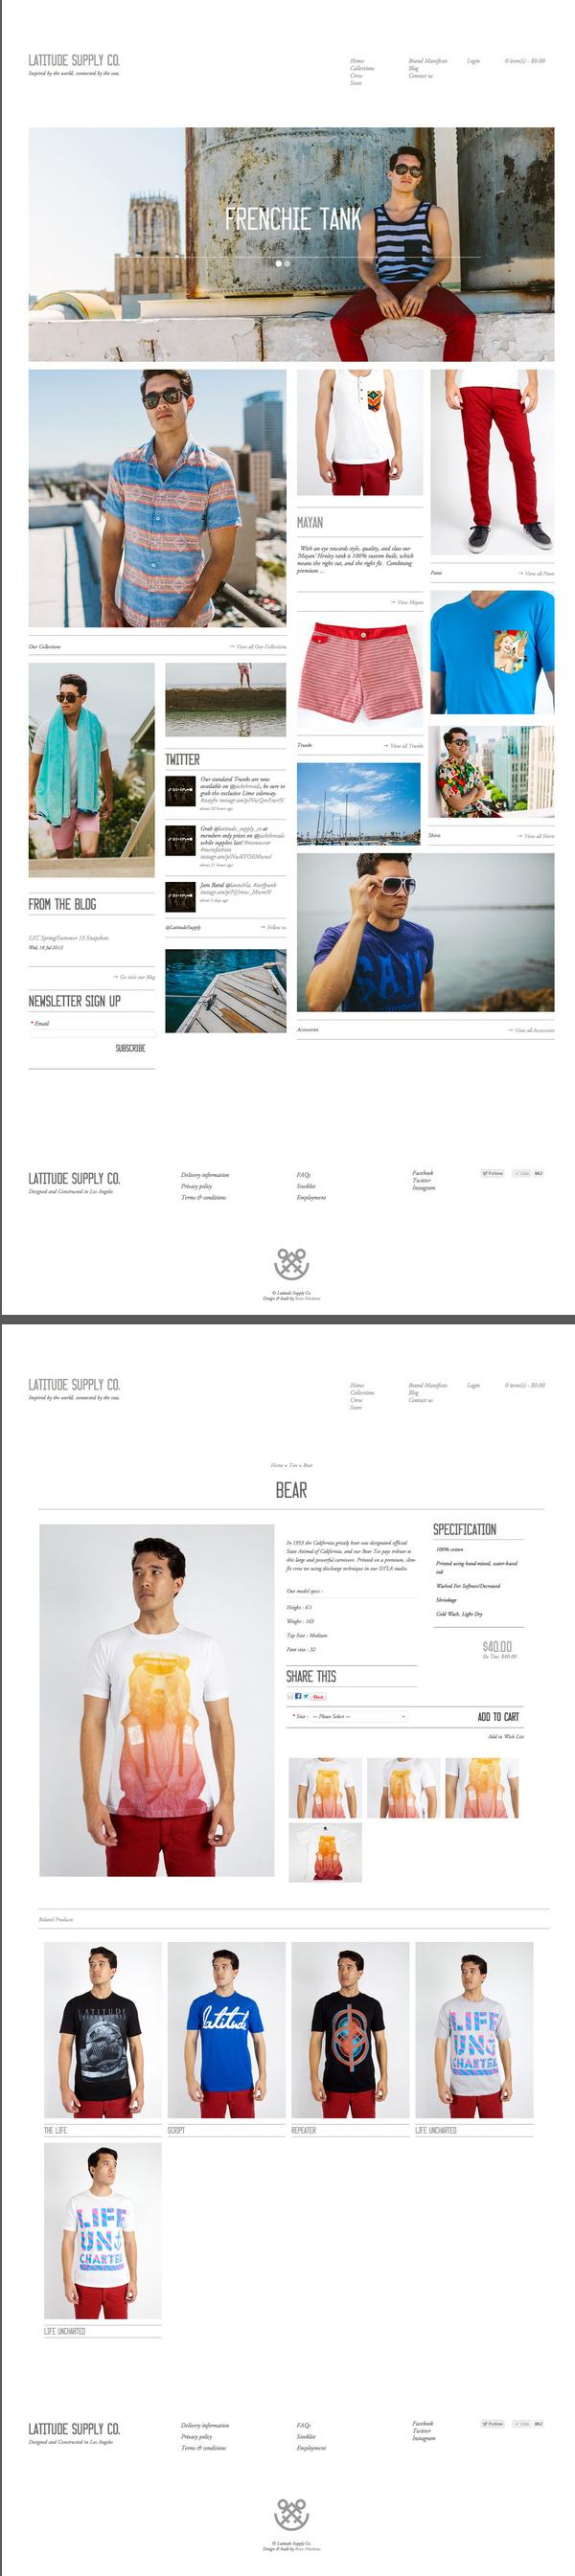 #web, #grid  http://www.webdesignserved.com/gallery/Latitude-Supply-Co/4715411